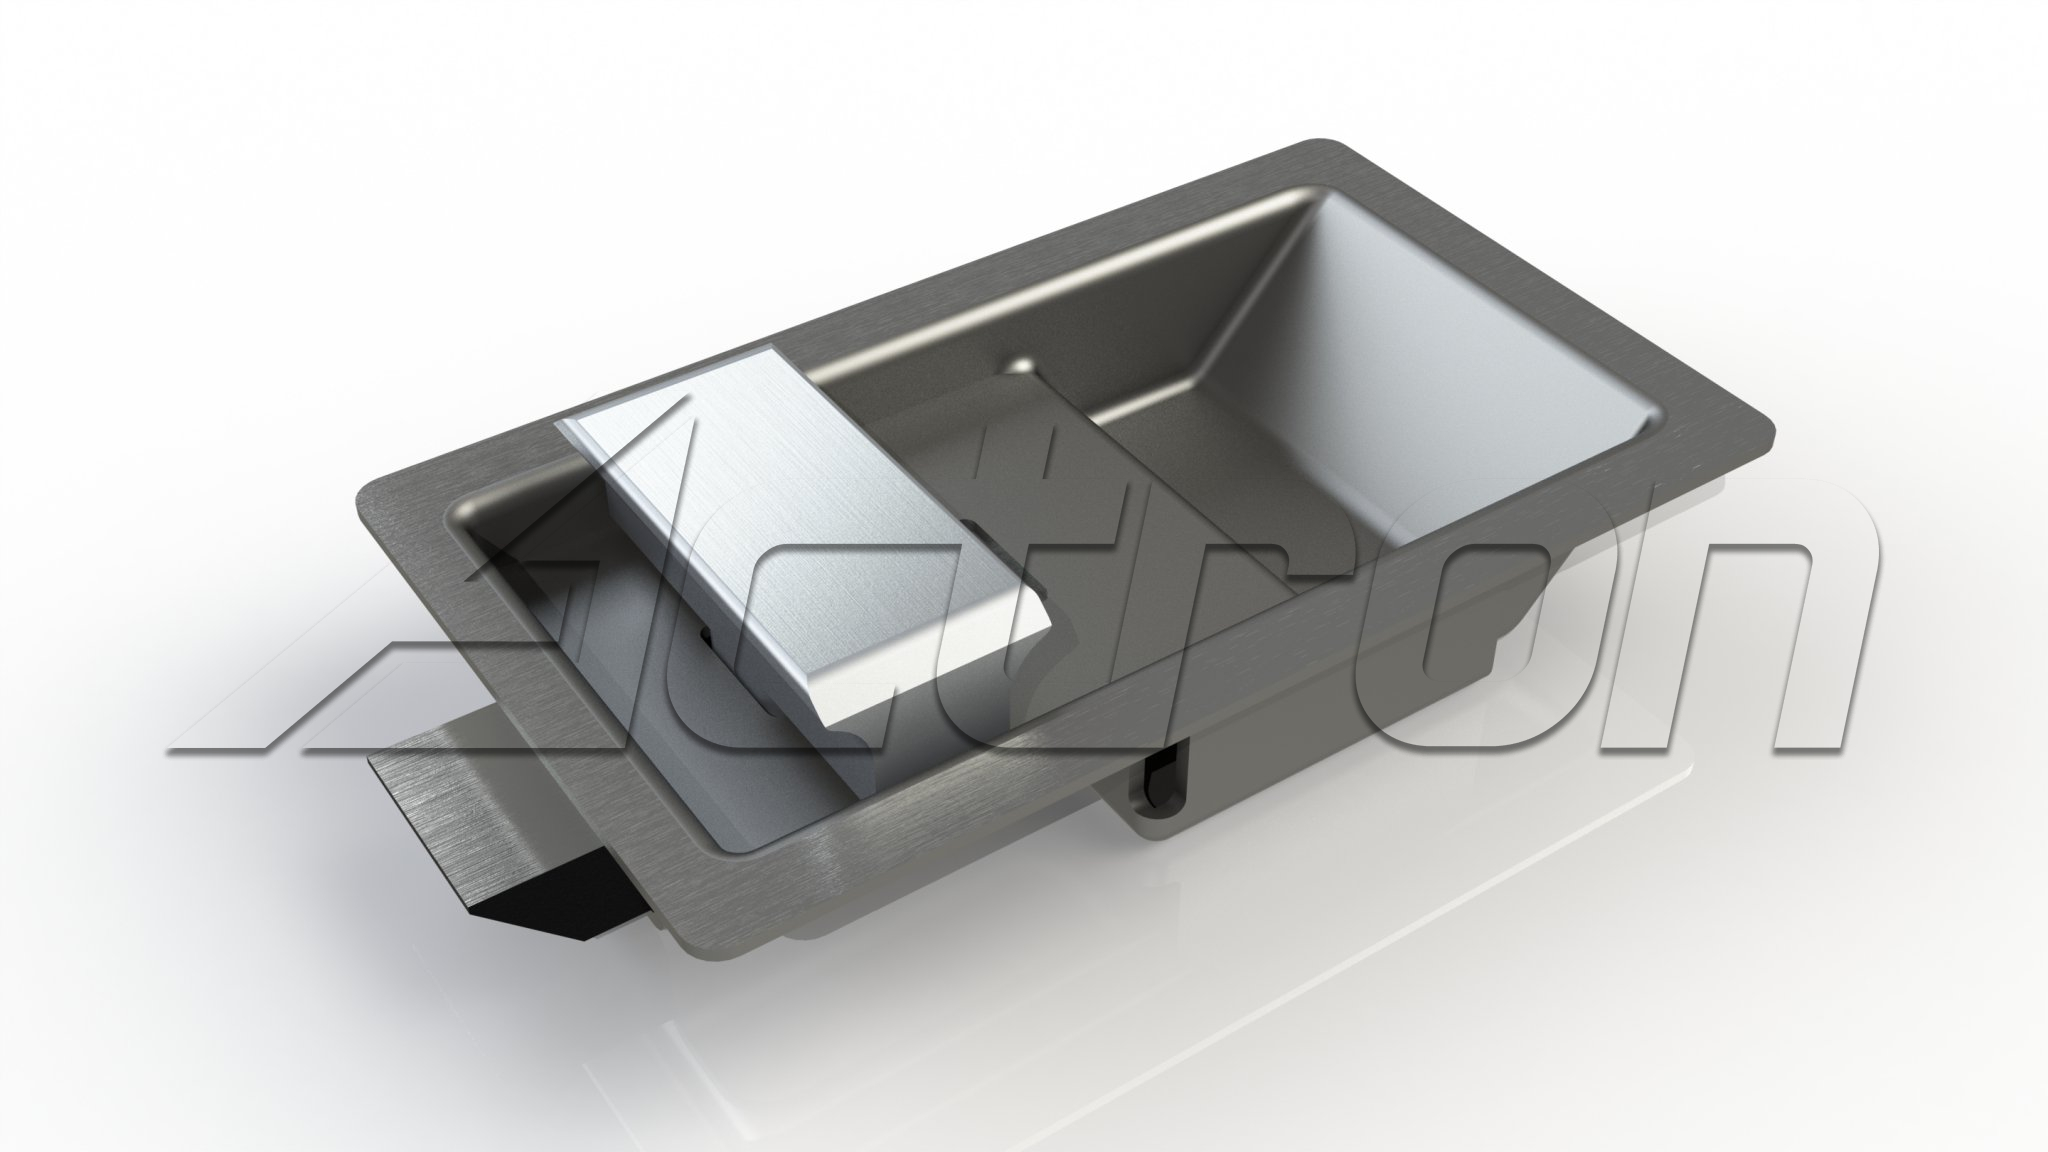 latch-assy-8211-sliding-w-noise-reduction-4024-a20125.jpg